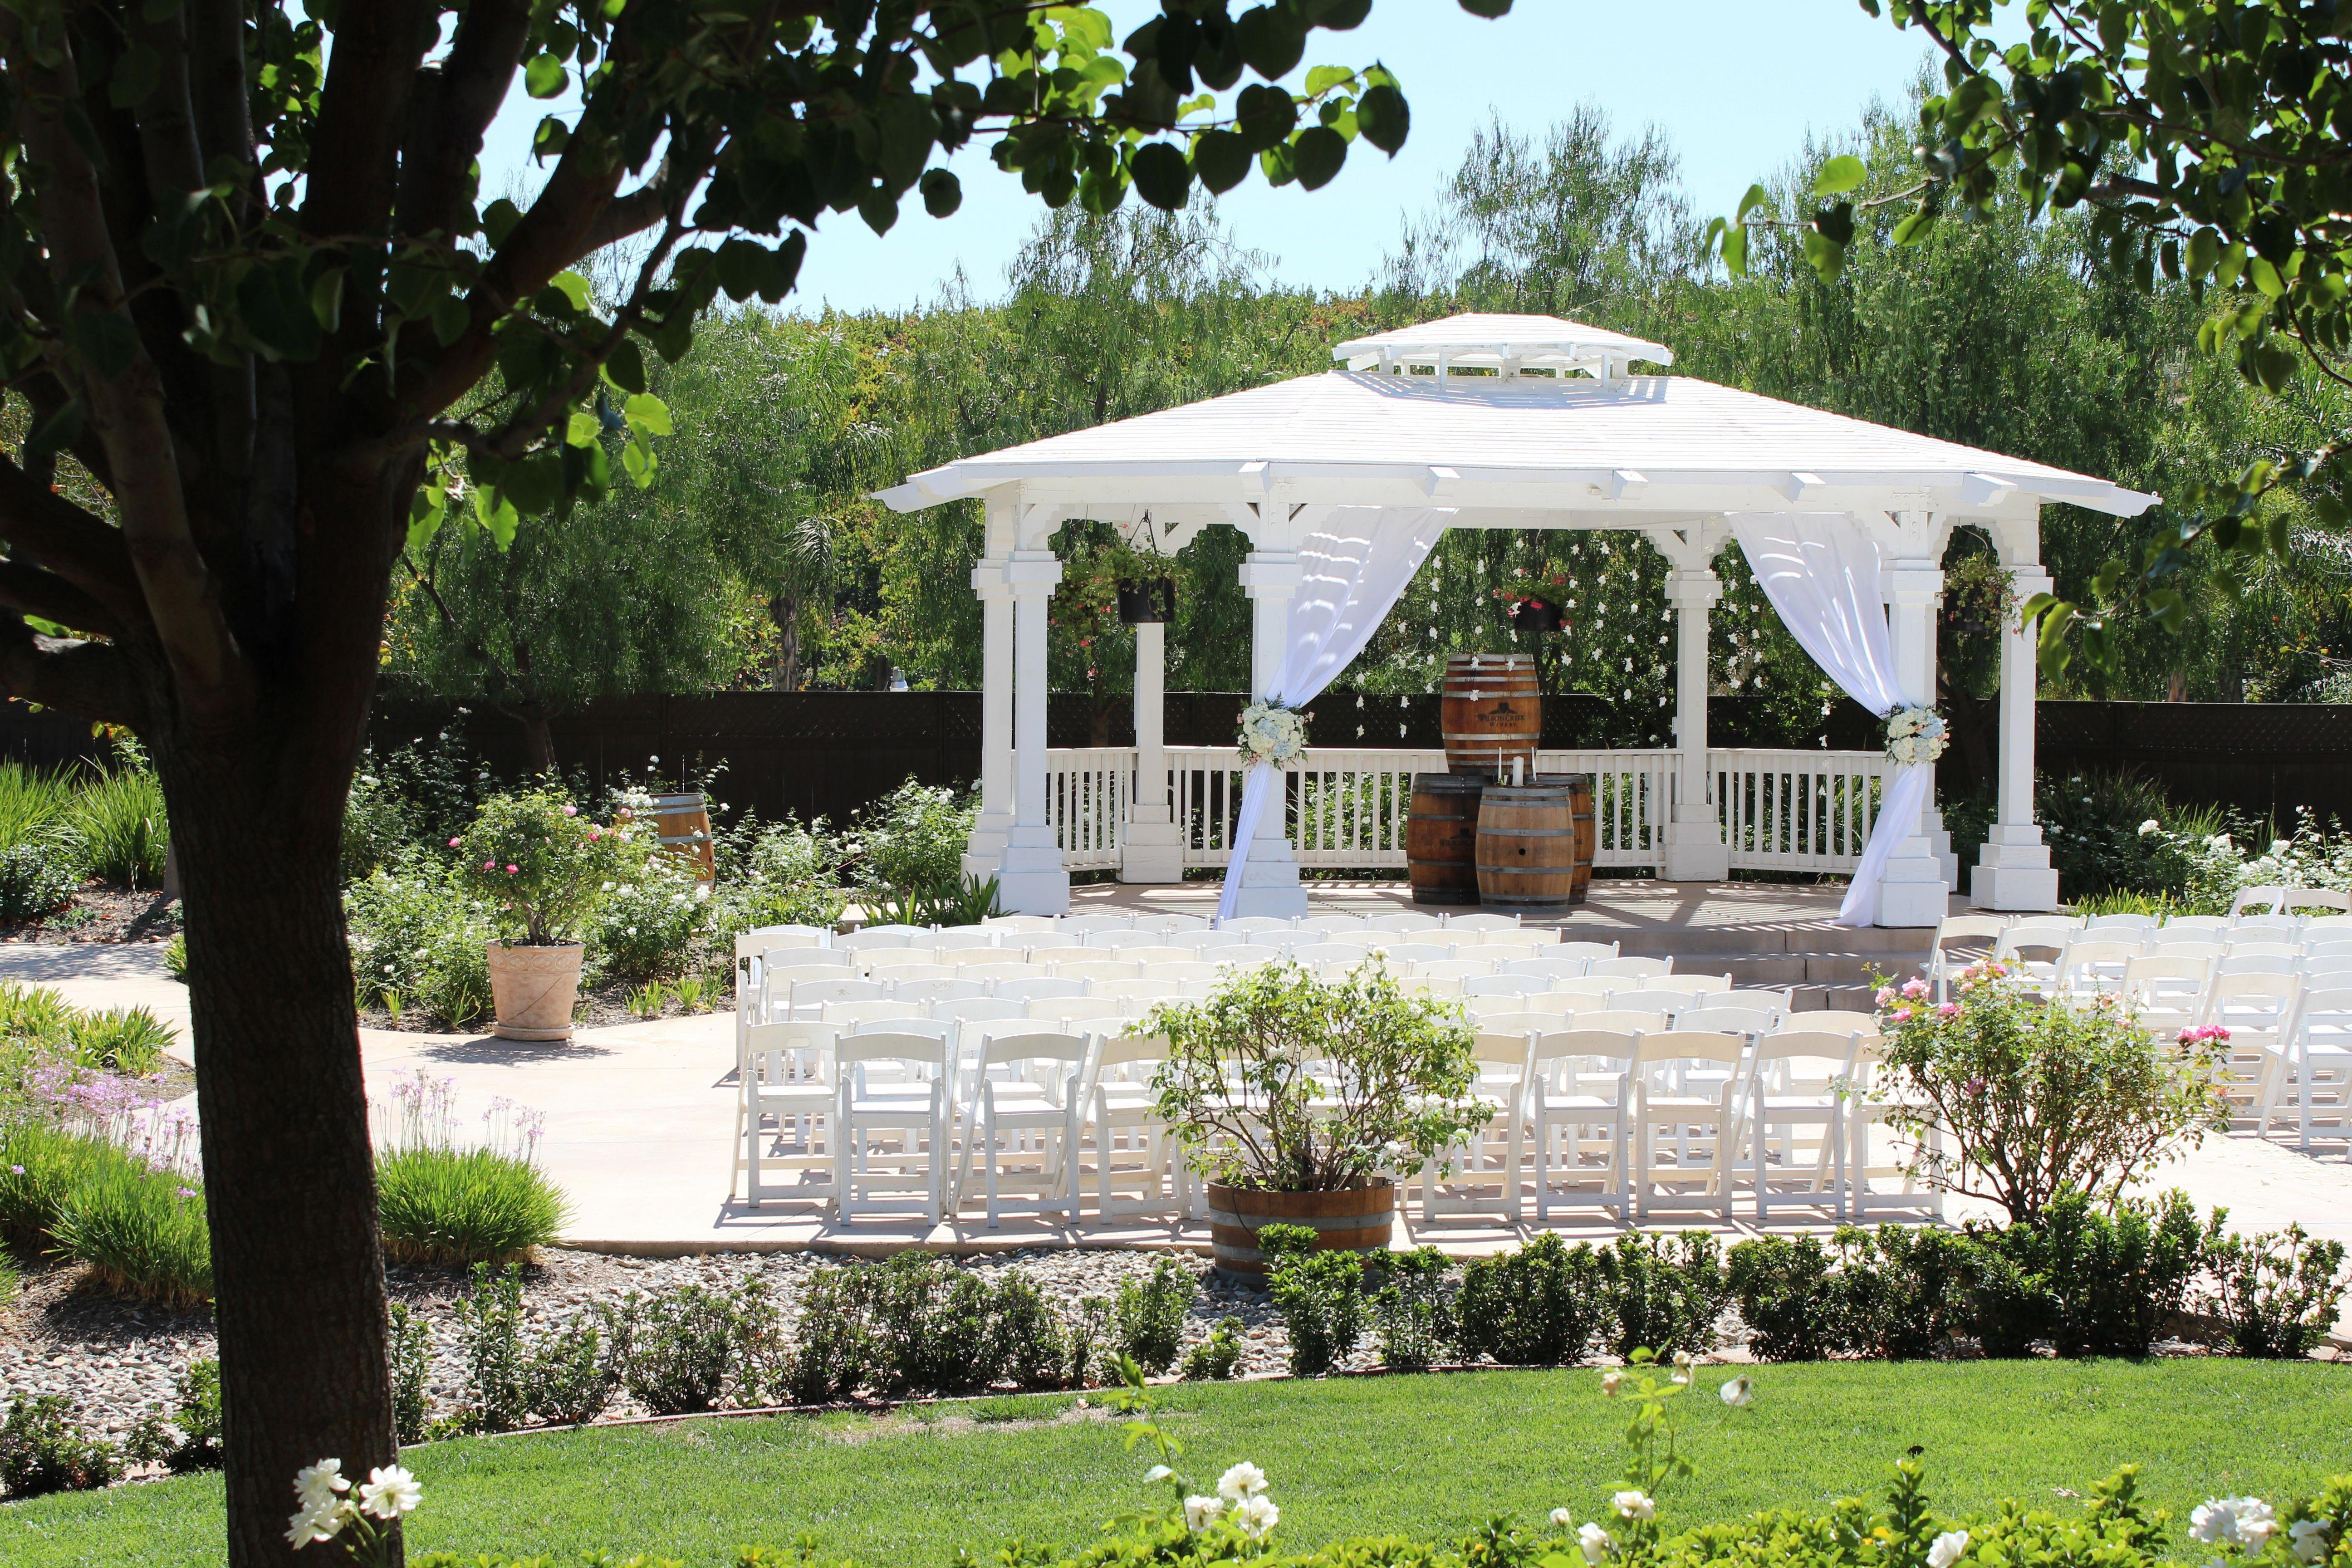 Wilson Creek Winery Vineyards Weddings A Temecula Wedding Setting Temeculawineries Temecula Wineries Wine Tours France Temecula